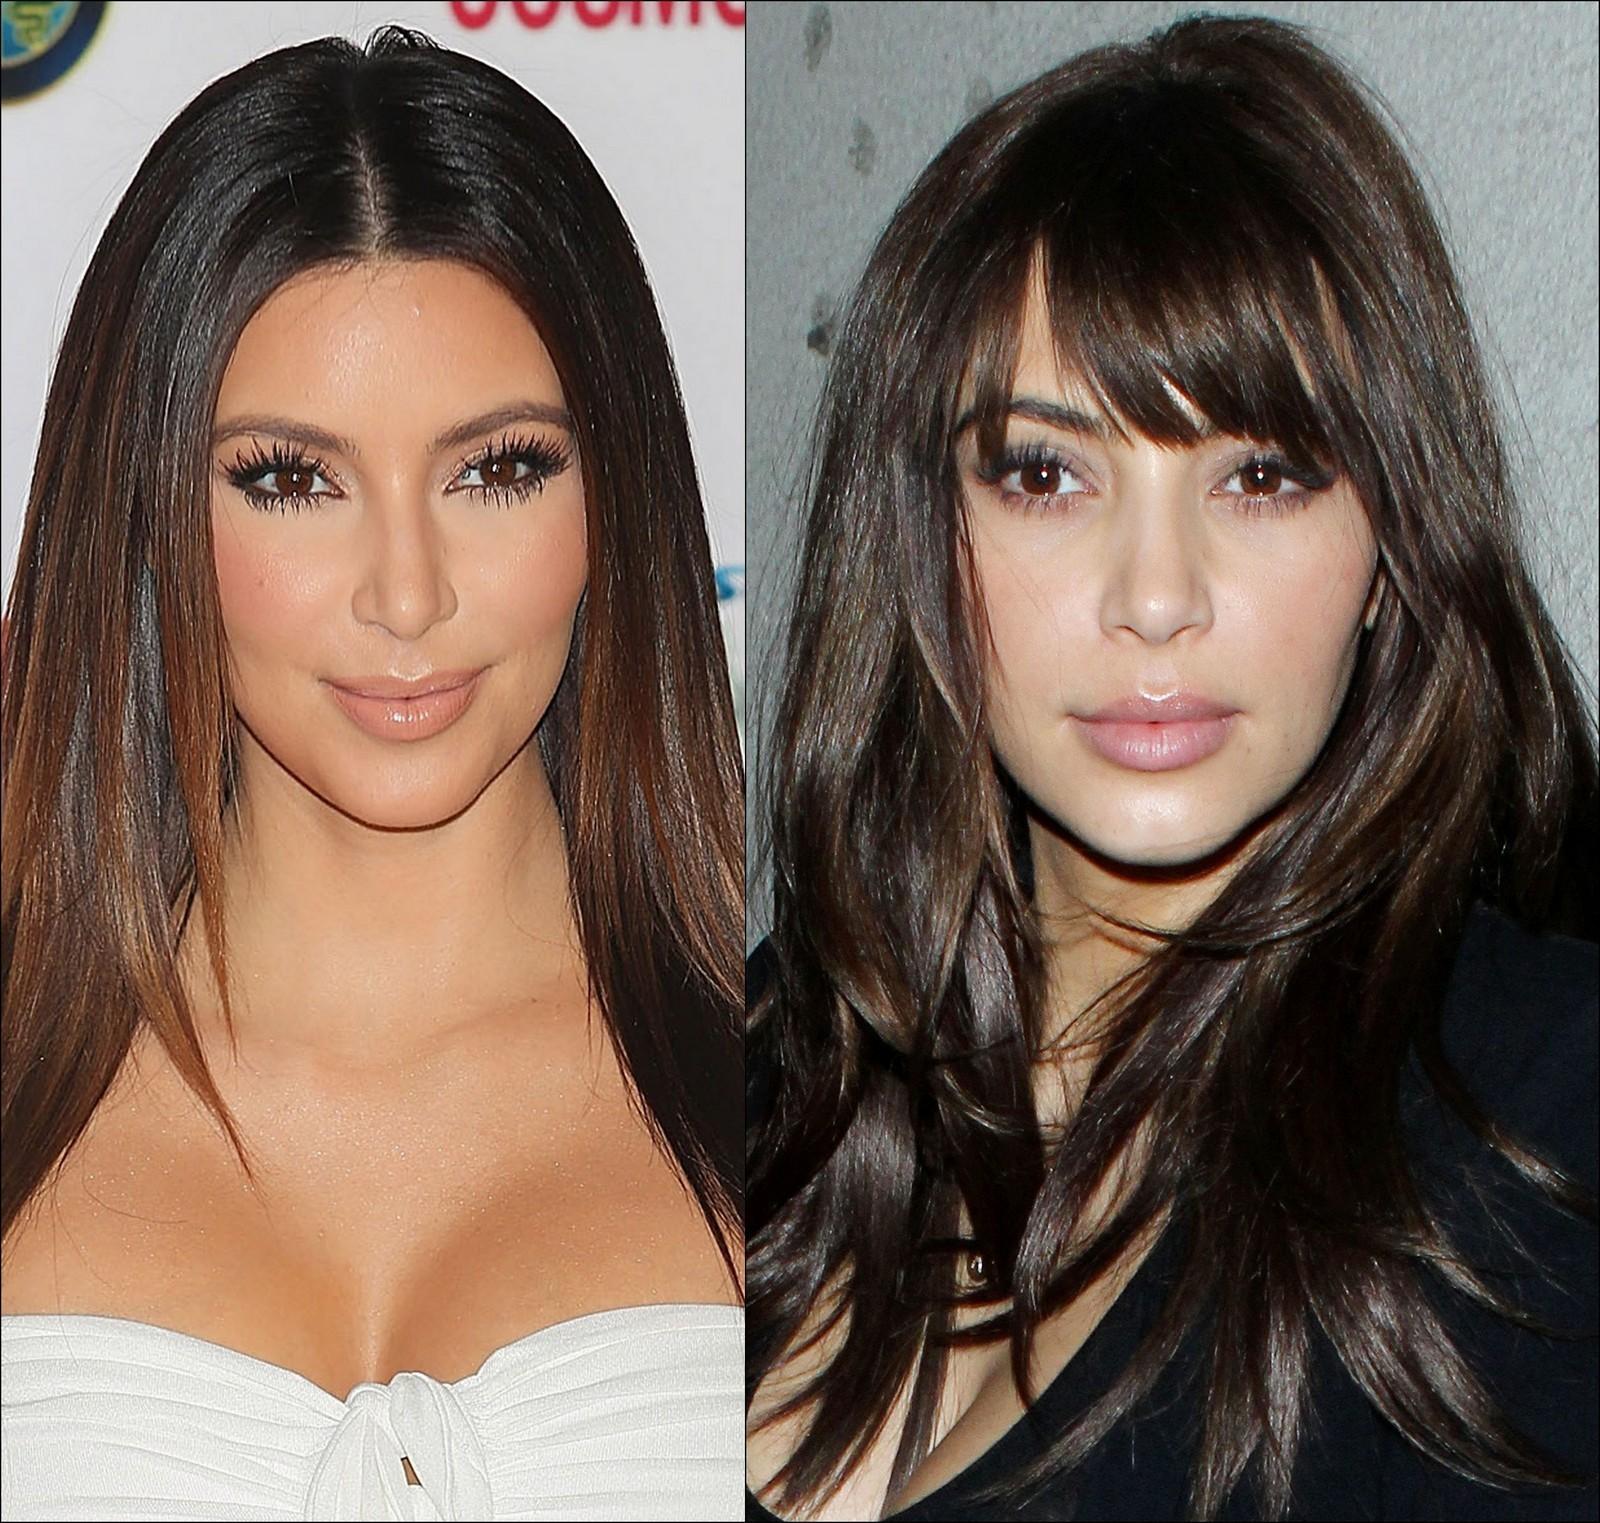 Kim Kardashian with and without bangs